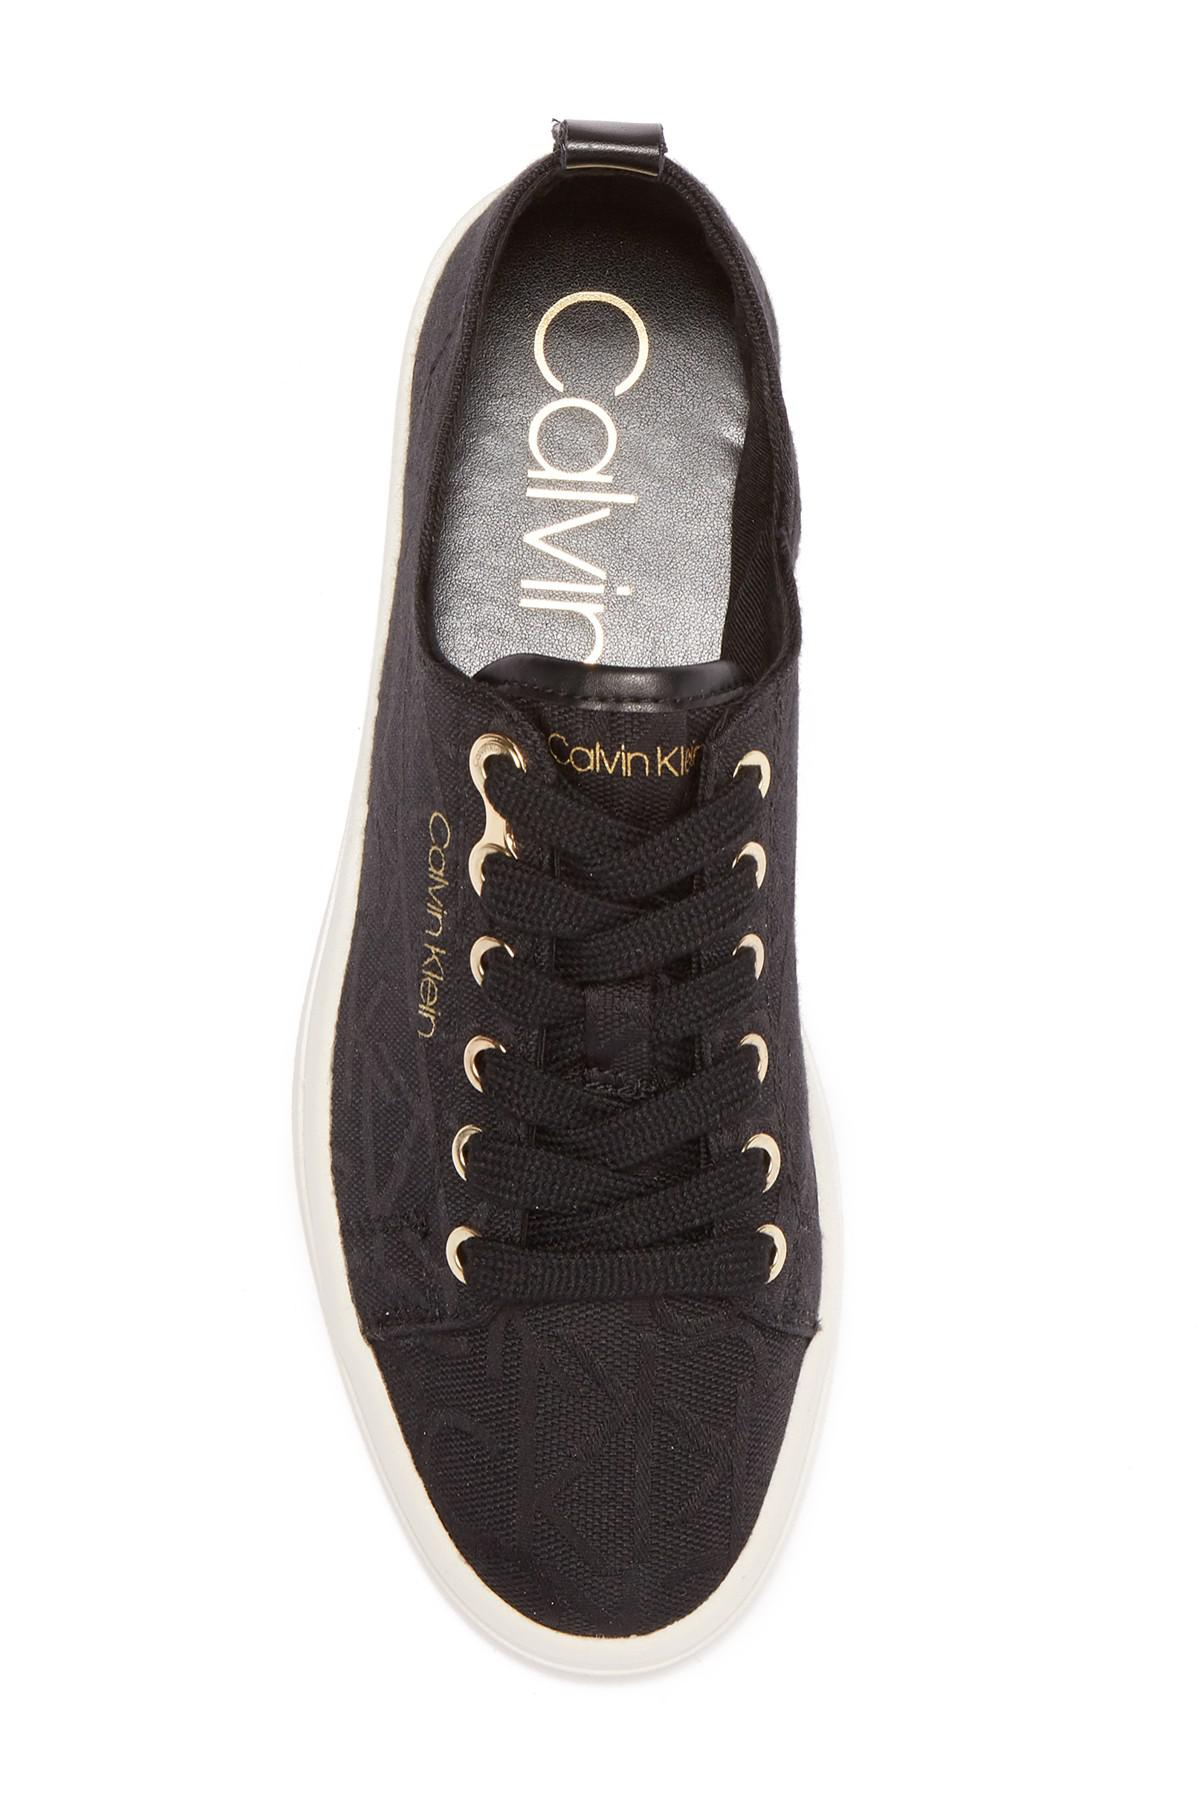 Calvin Klein Michaela 2 Sneaker in